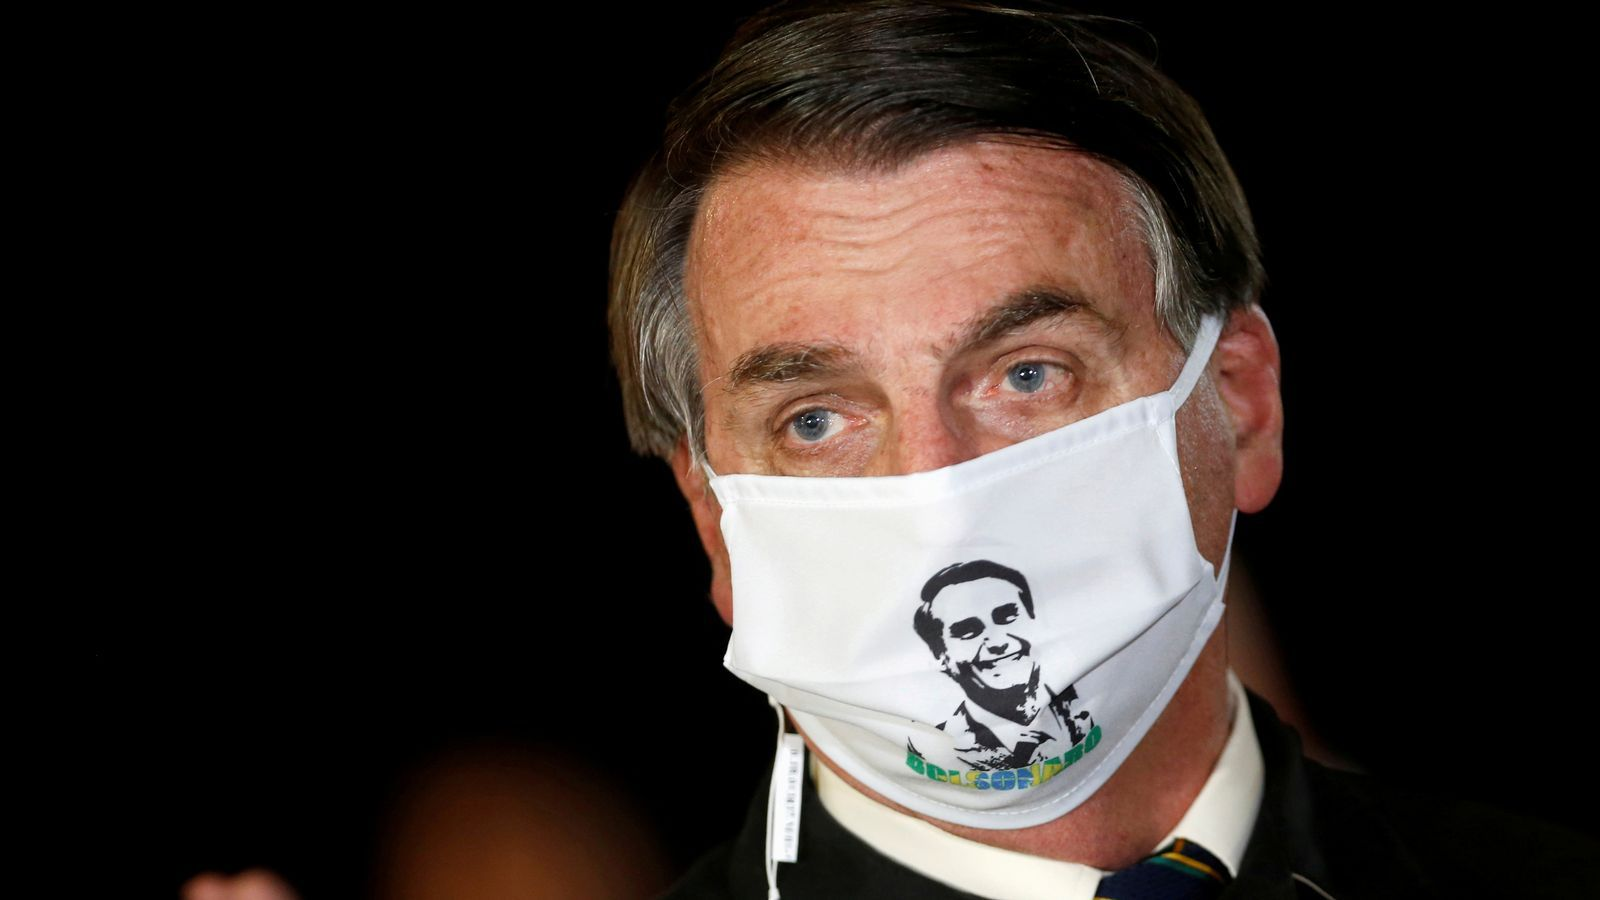 El negacionista president del Brasil Jair Bolsonaro, positiu per coronavirus